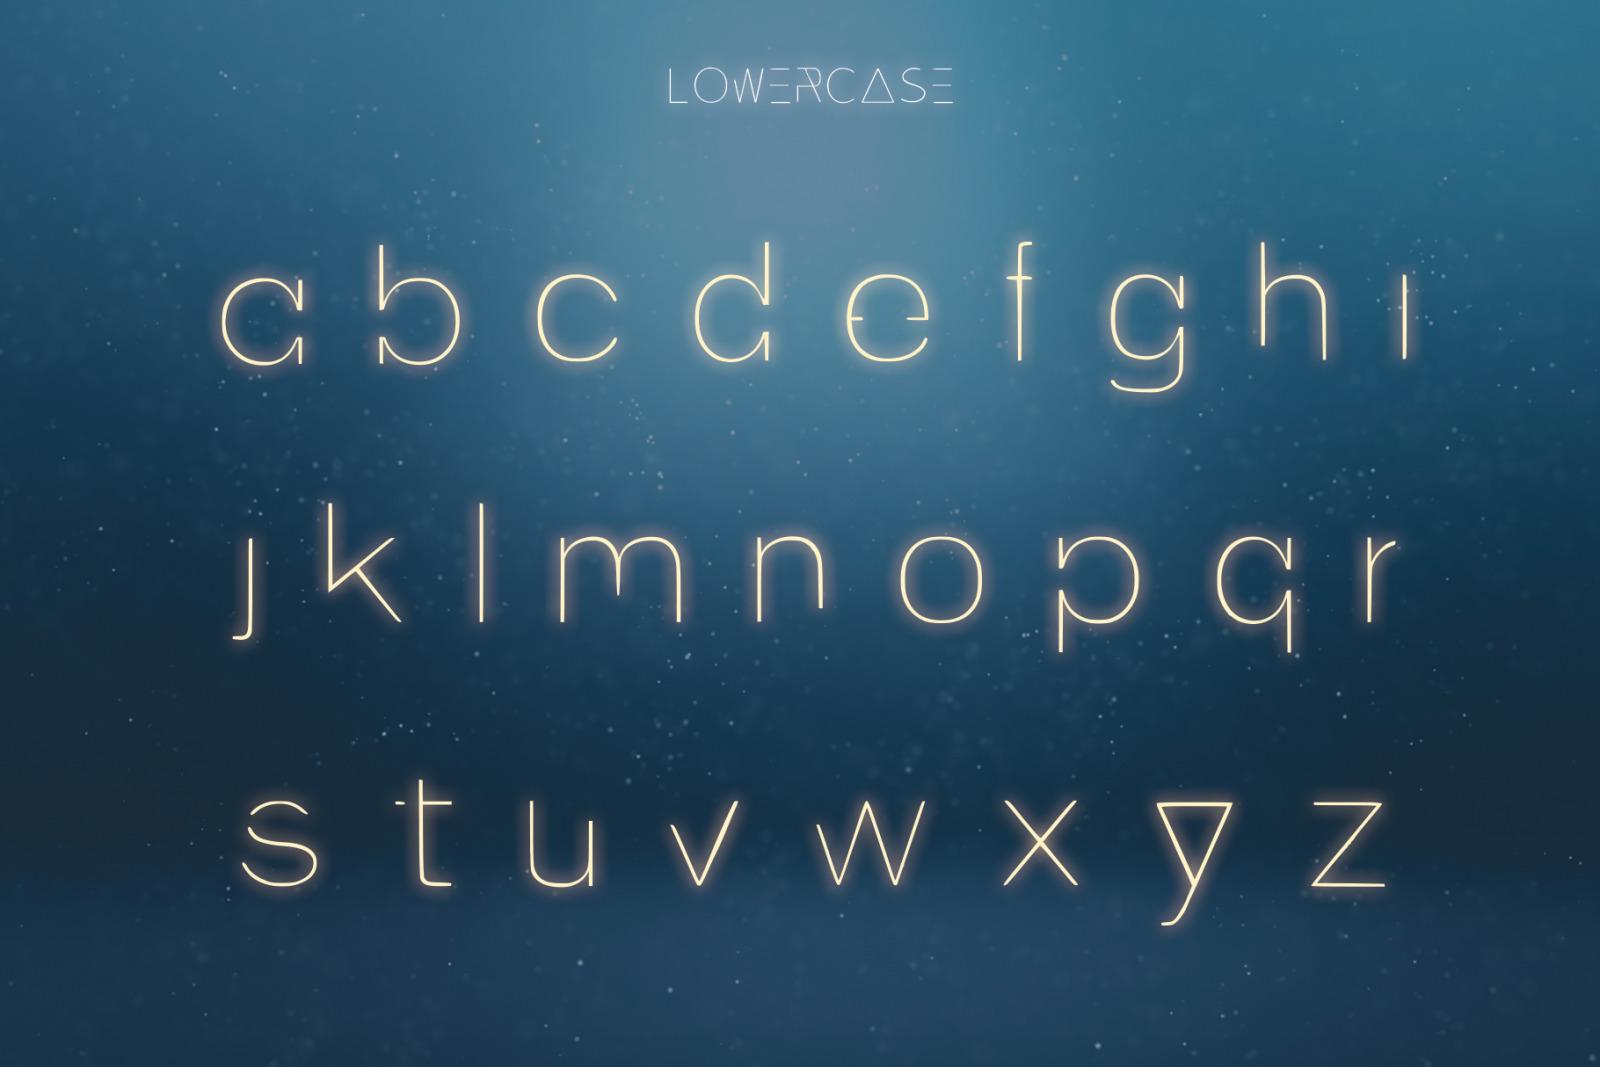 EXOPLANET - A Futuristic Typeface